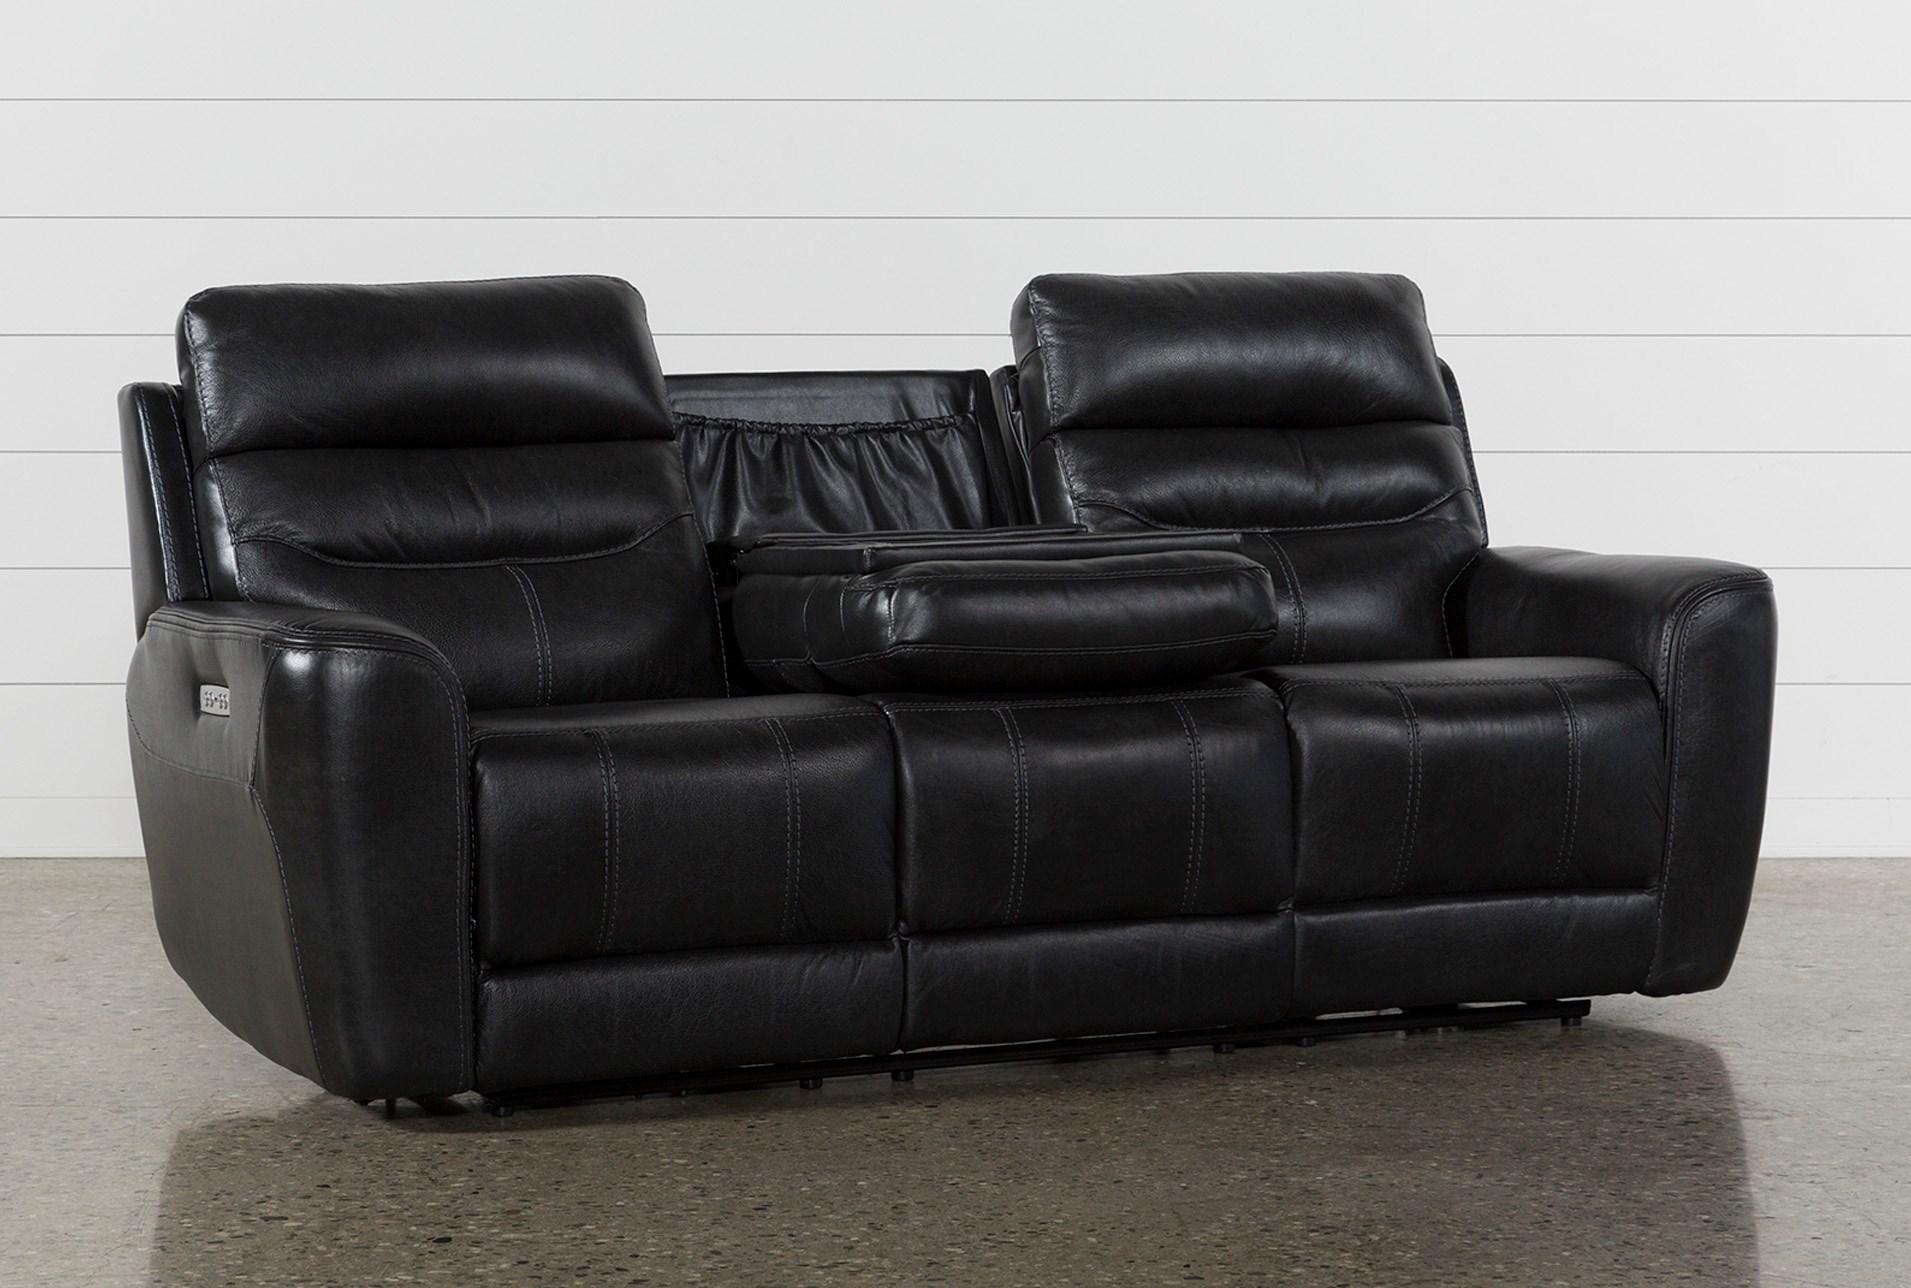 Cheyenne Black Leather Power Reclining Sofa W Pwr Headrest Drop